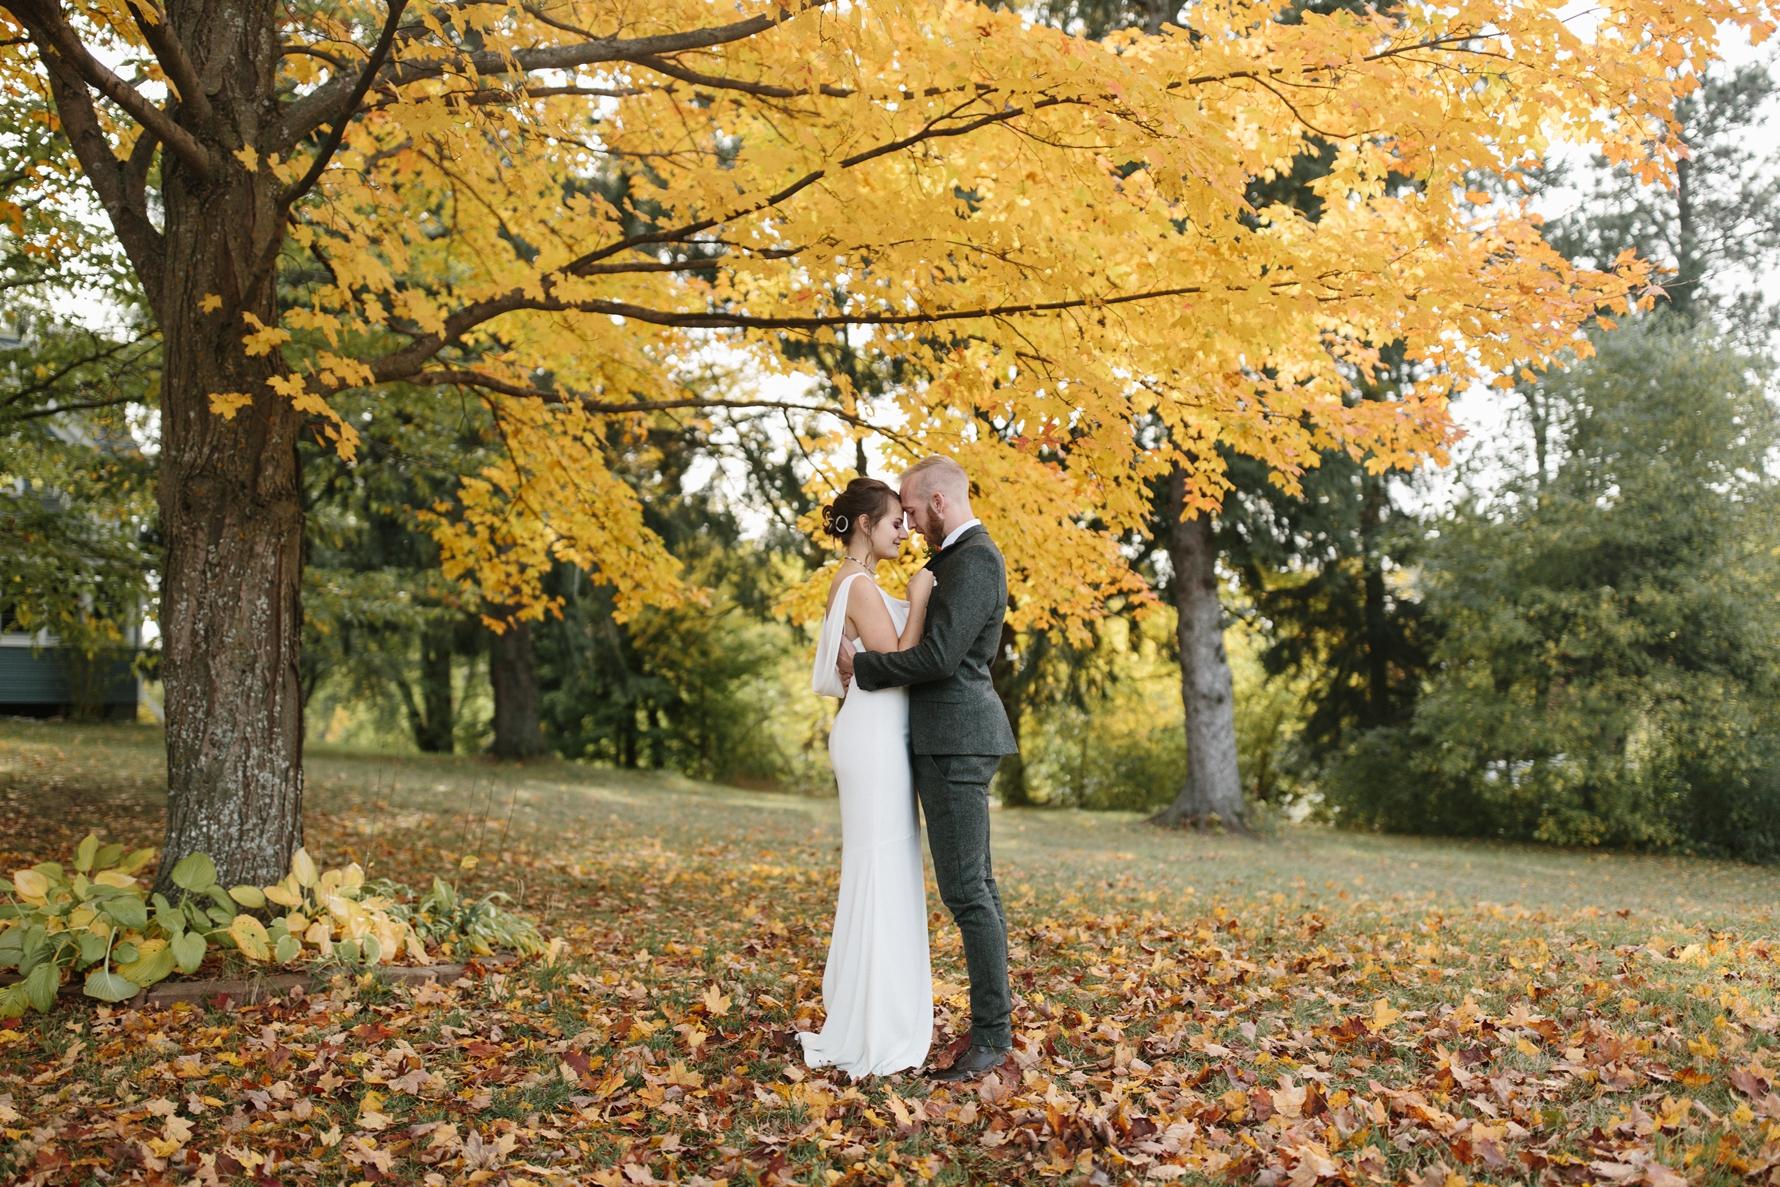 norris-traverse-city-wedding-26.JPG